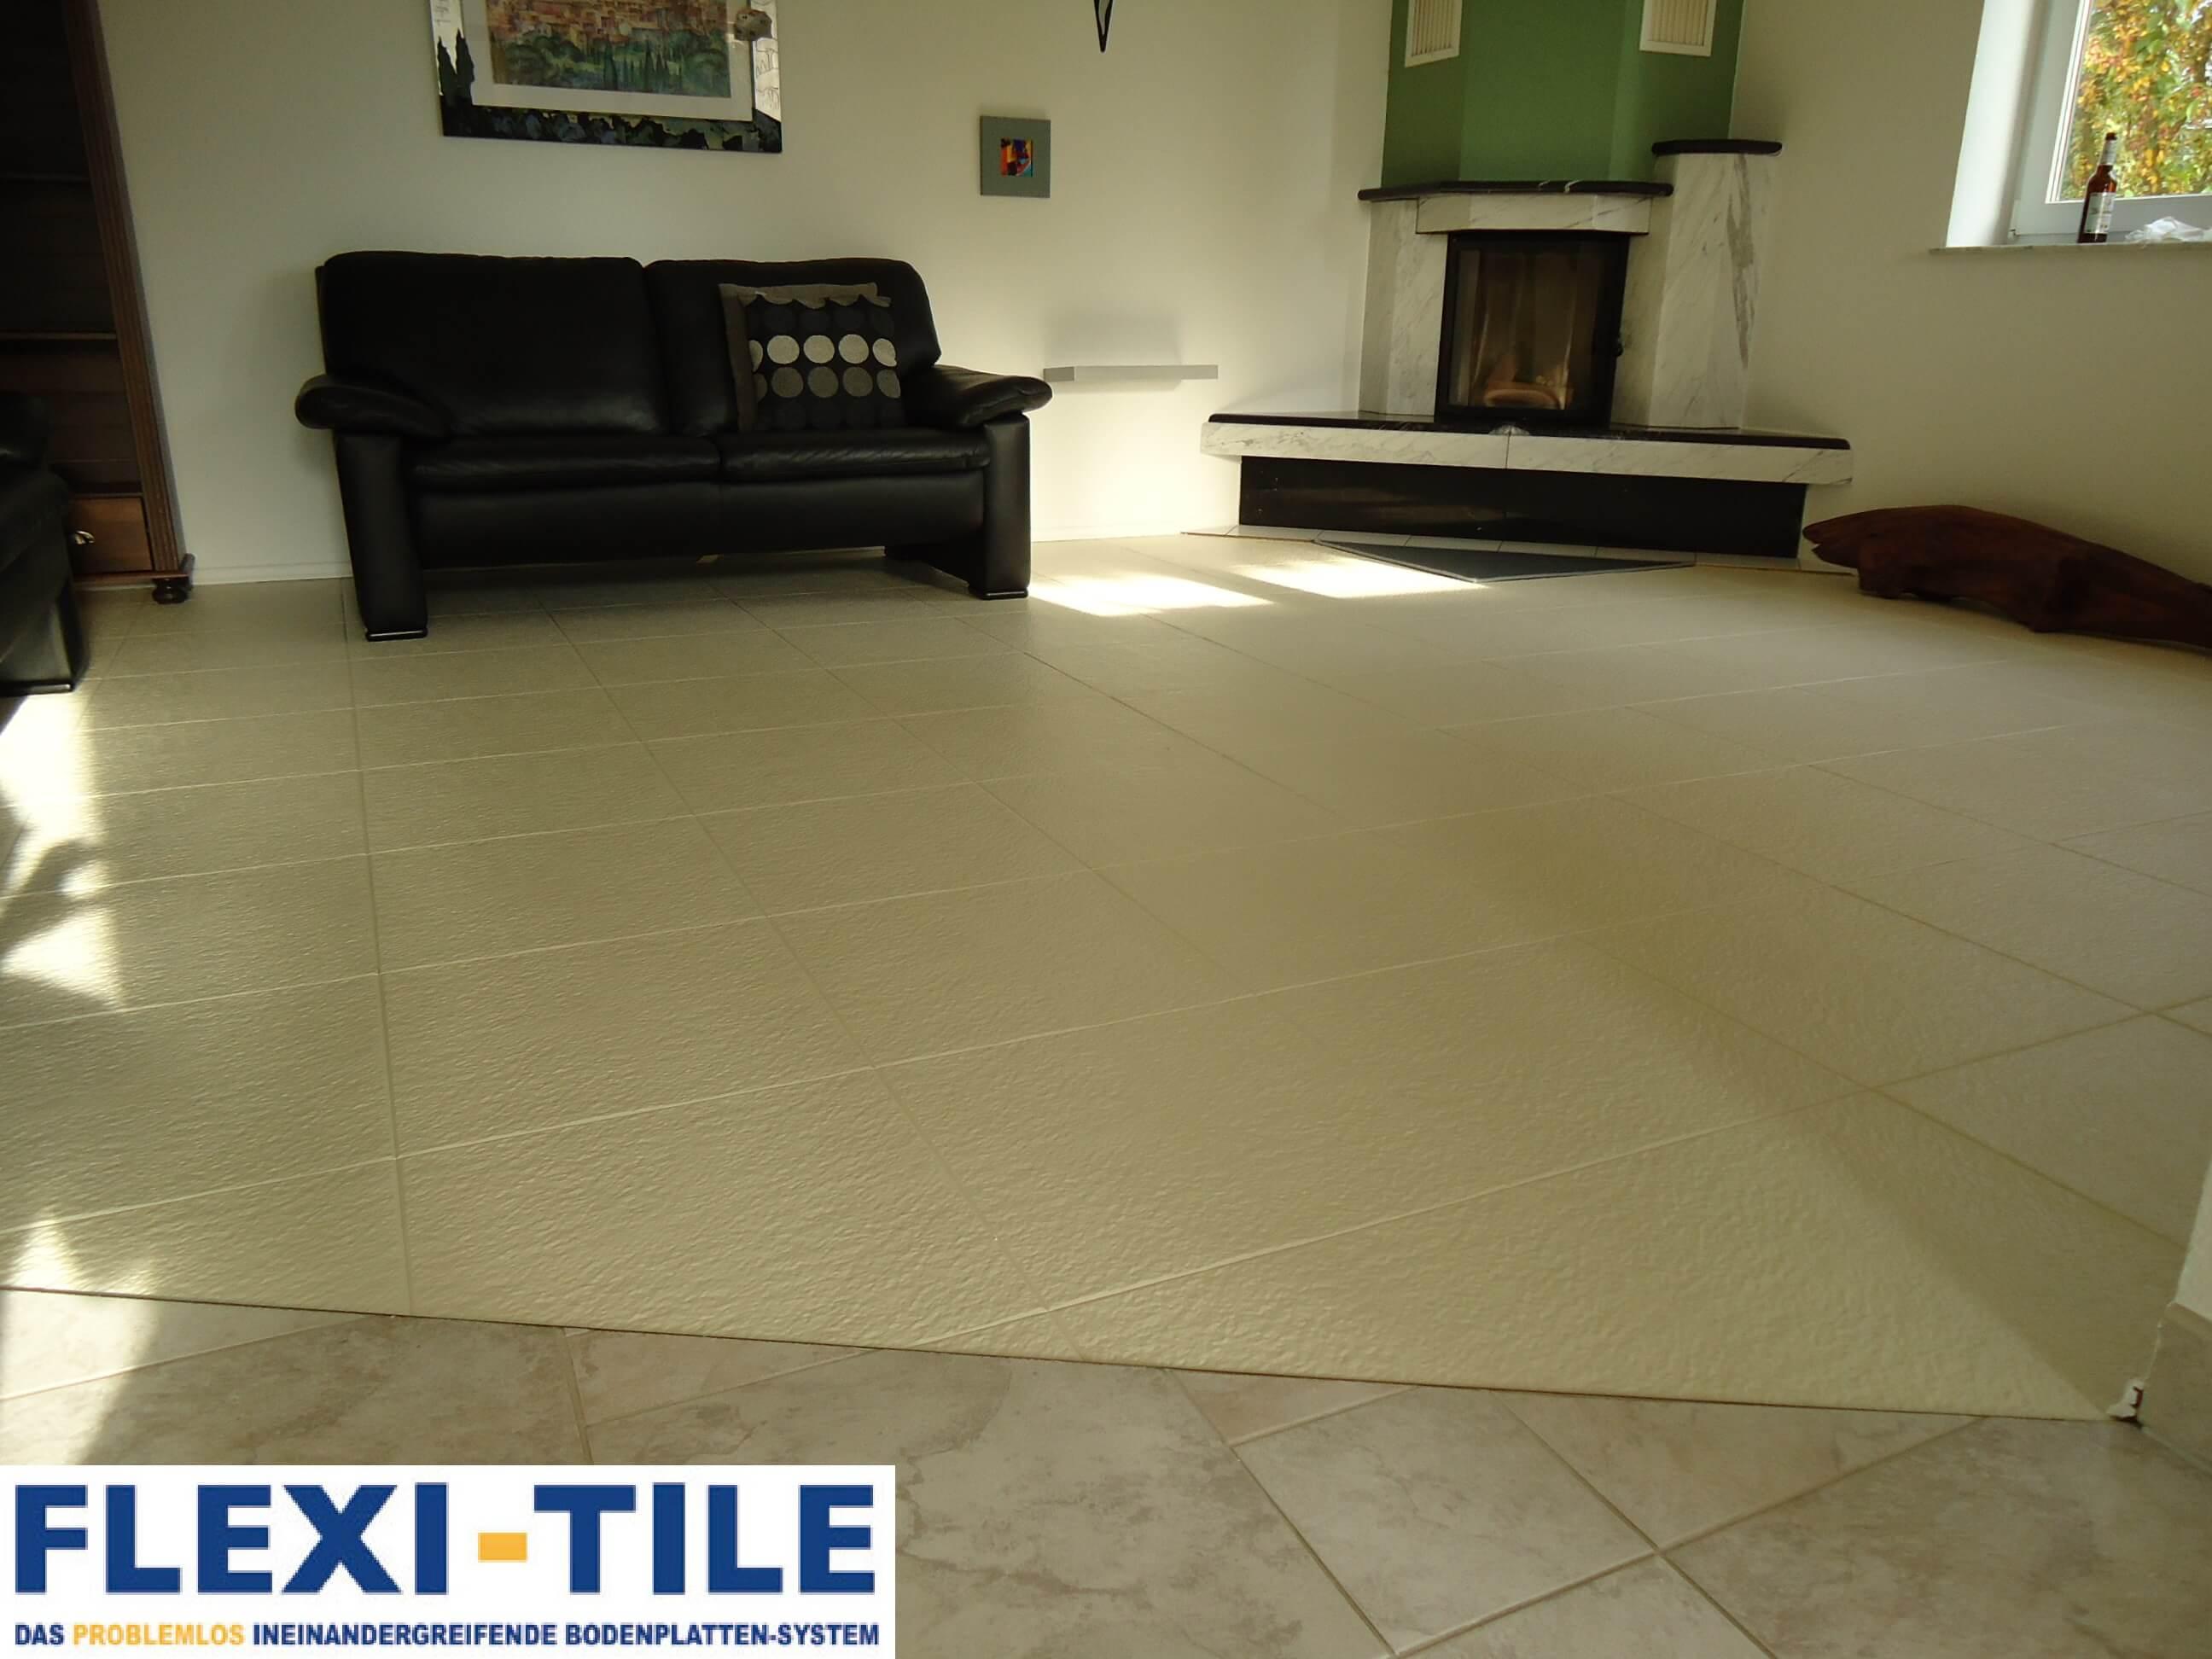 Flexi-Tile Eclipse Mini im Wohnzimmer » PVC Fußbodenbelag - PVC